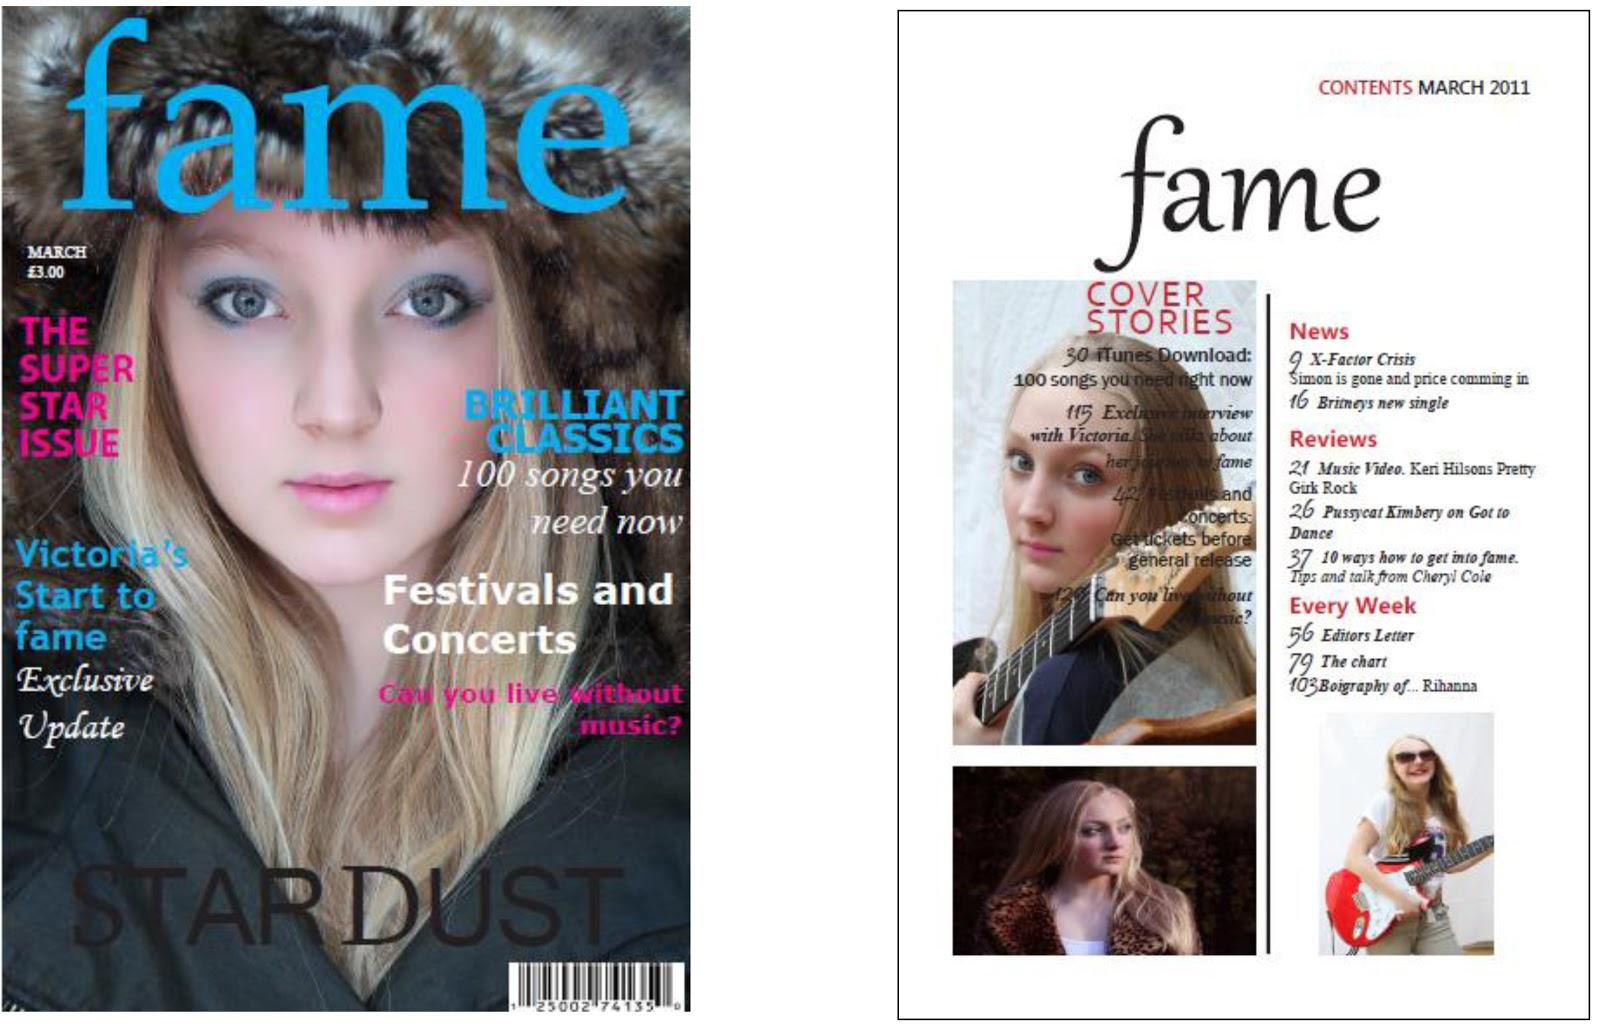 media coursework music magazine